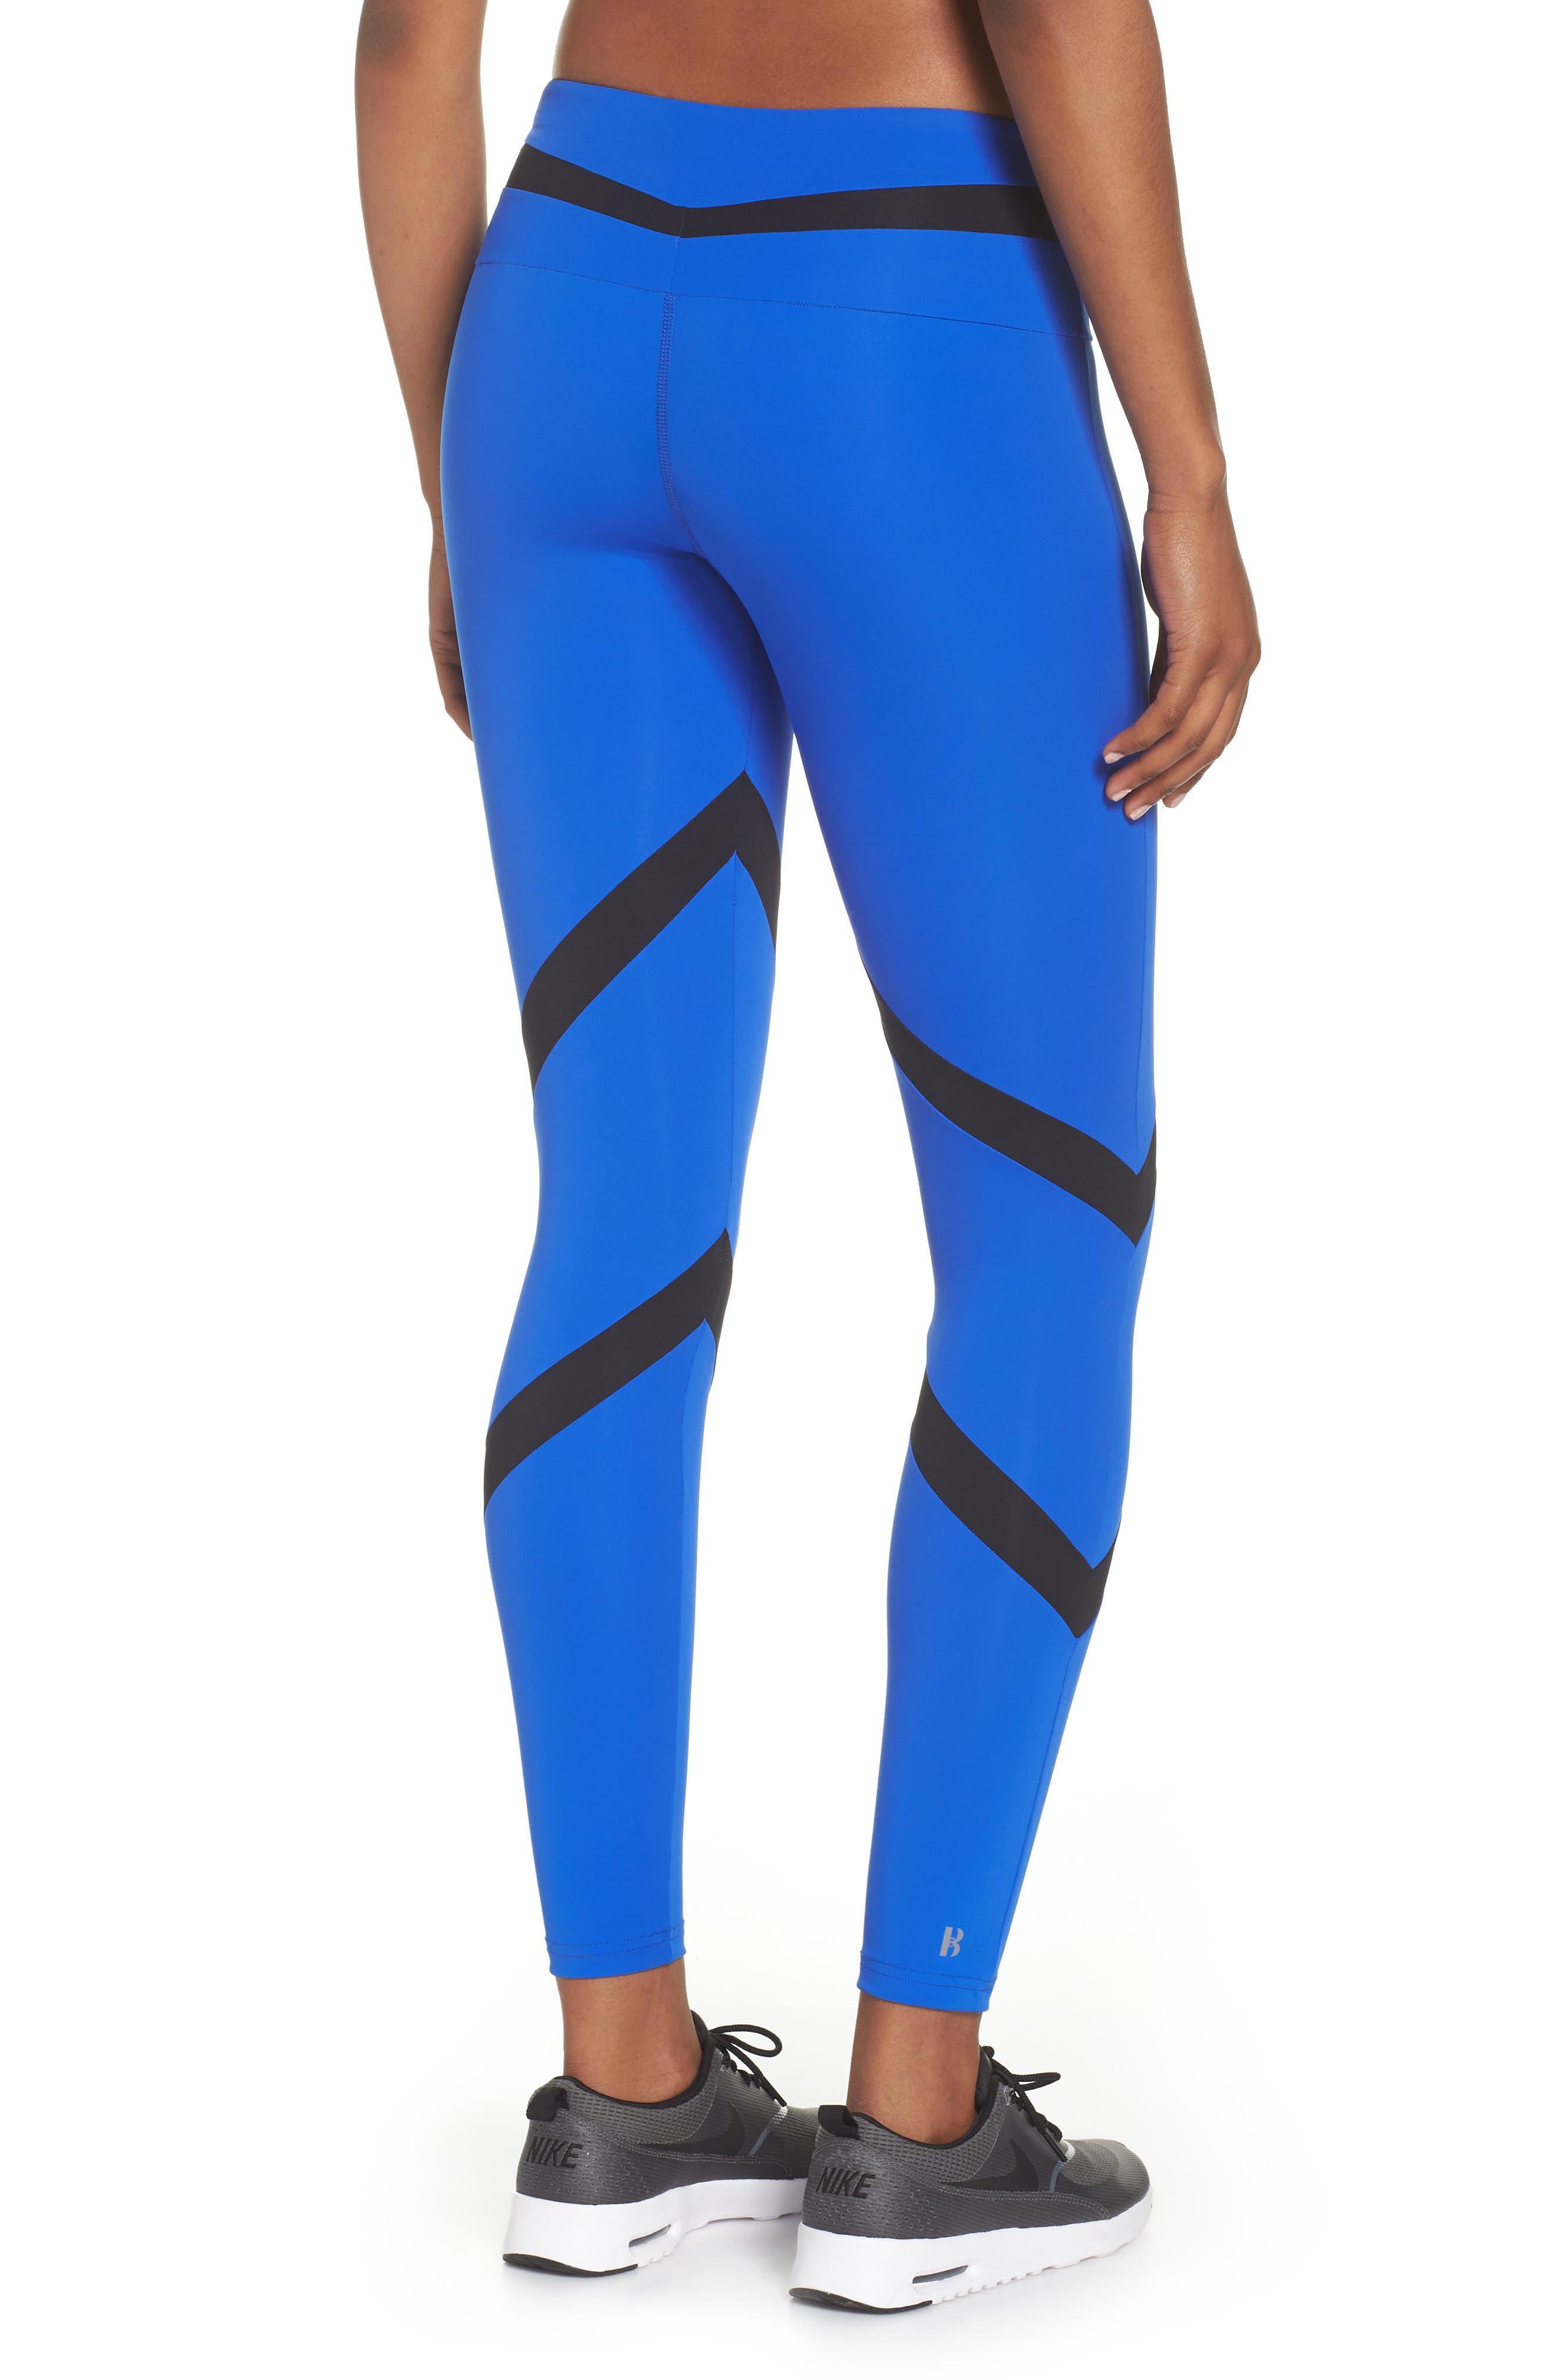 BoomBoom Athletica Tricolor Leggings,                             Alternate thumbnail 2, color,                             Cobalt Blue/ Black